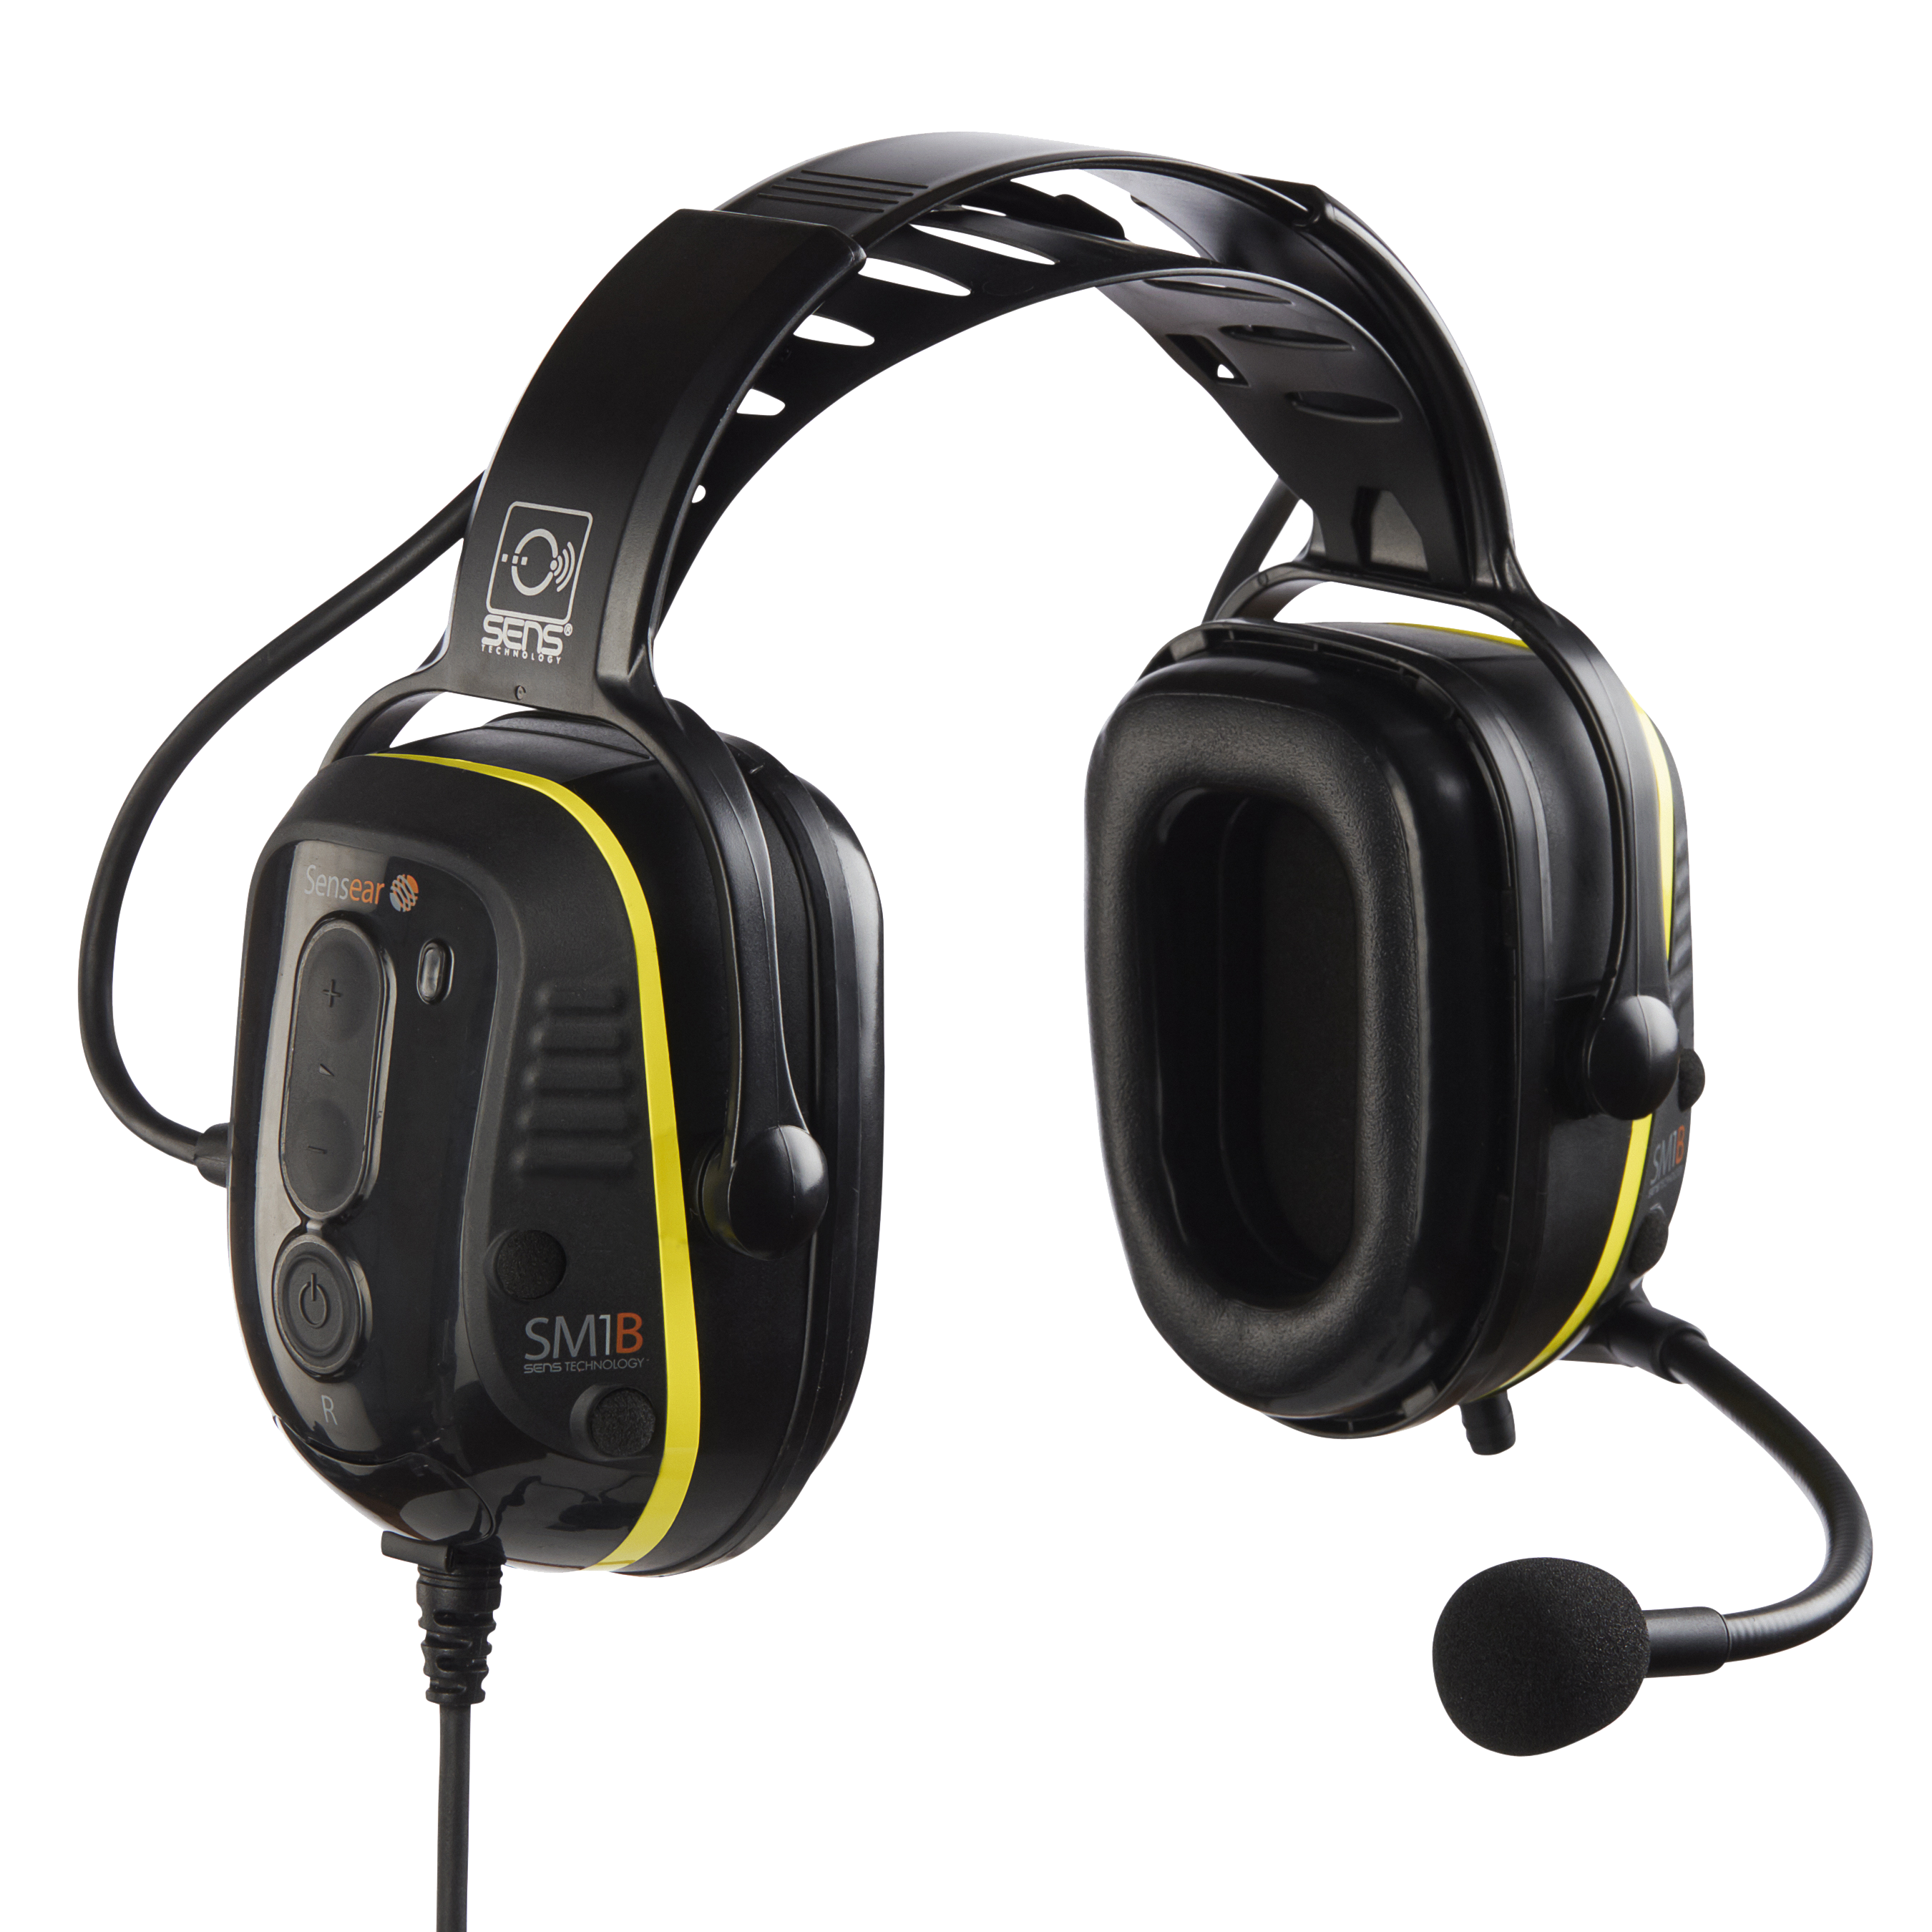 SM1B Two-way Radio Headsets